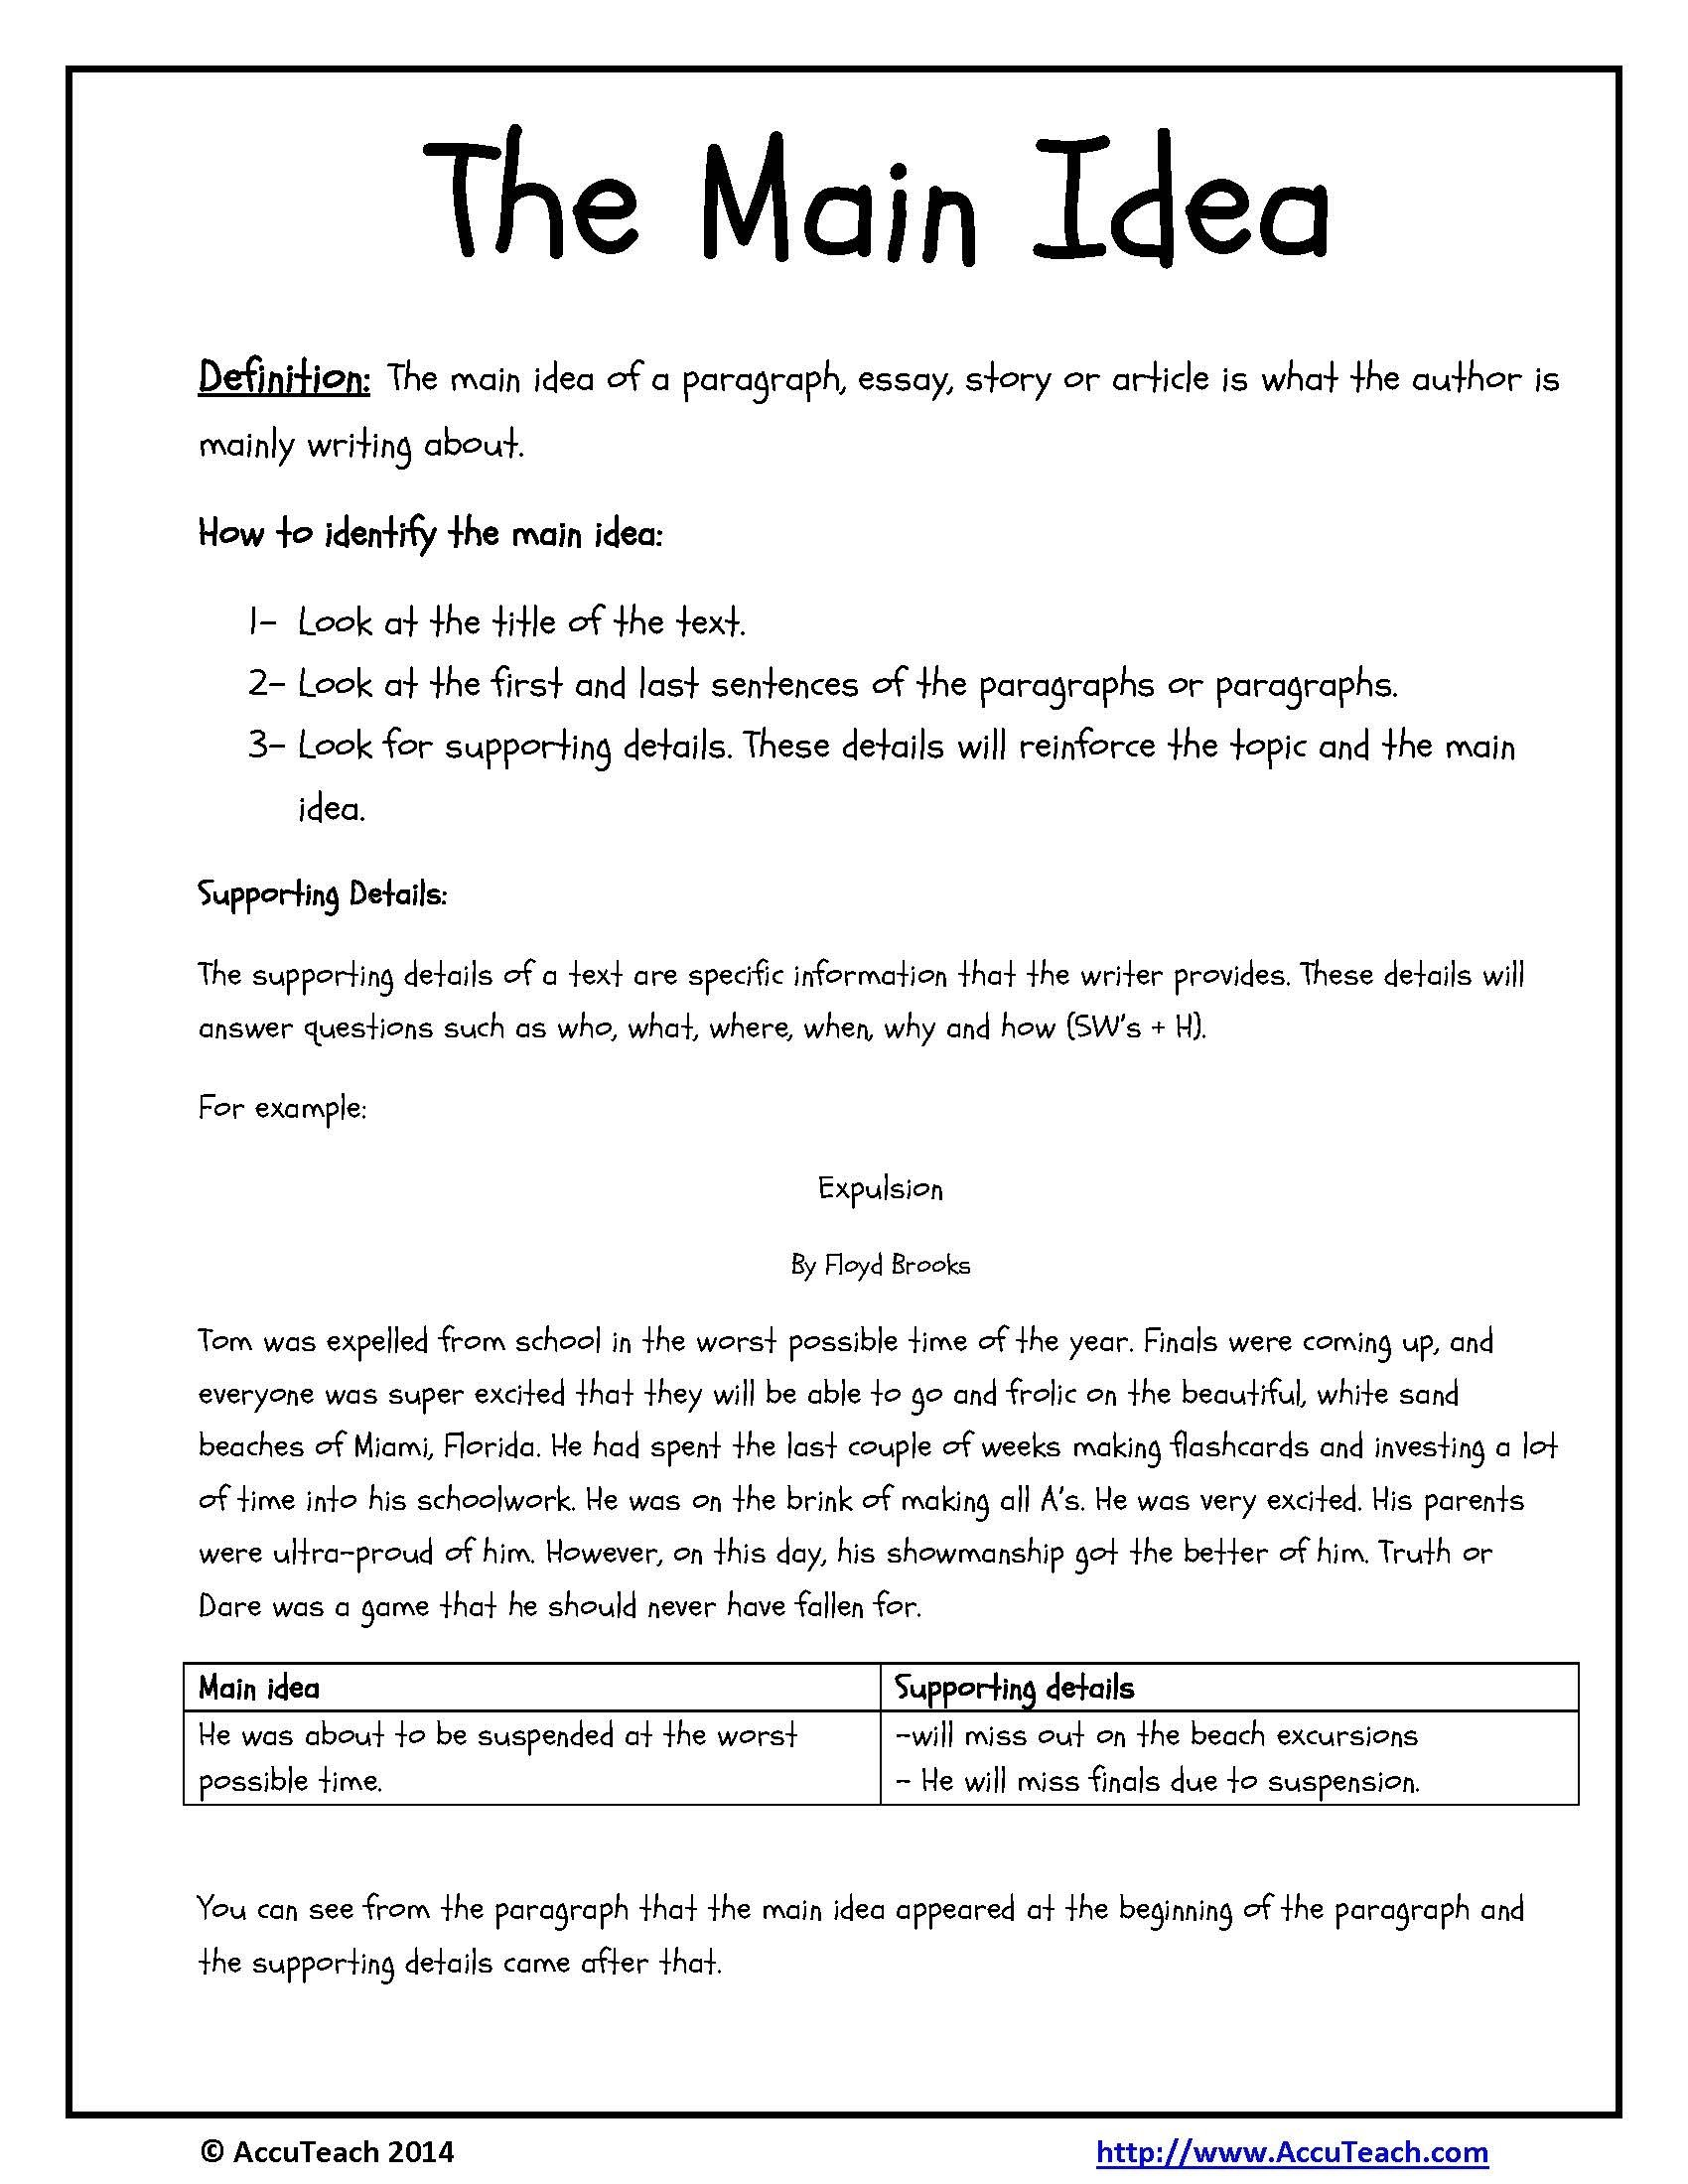 10 Fashionable Definition Of Main Idea For Kids kindergarten reading comprehension essay reading comprehension 2020